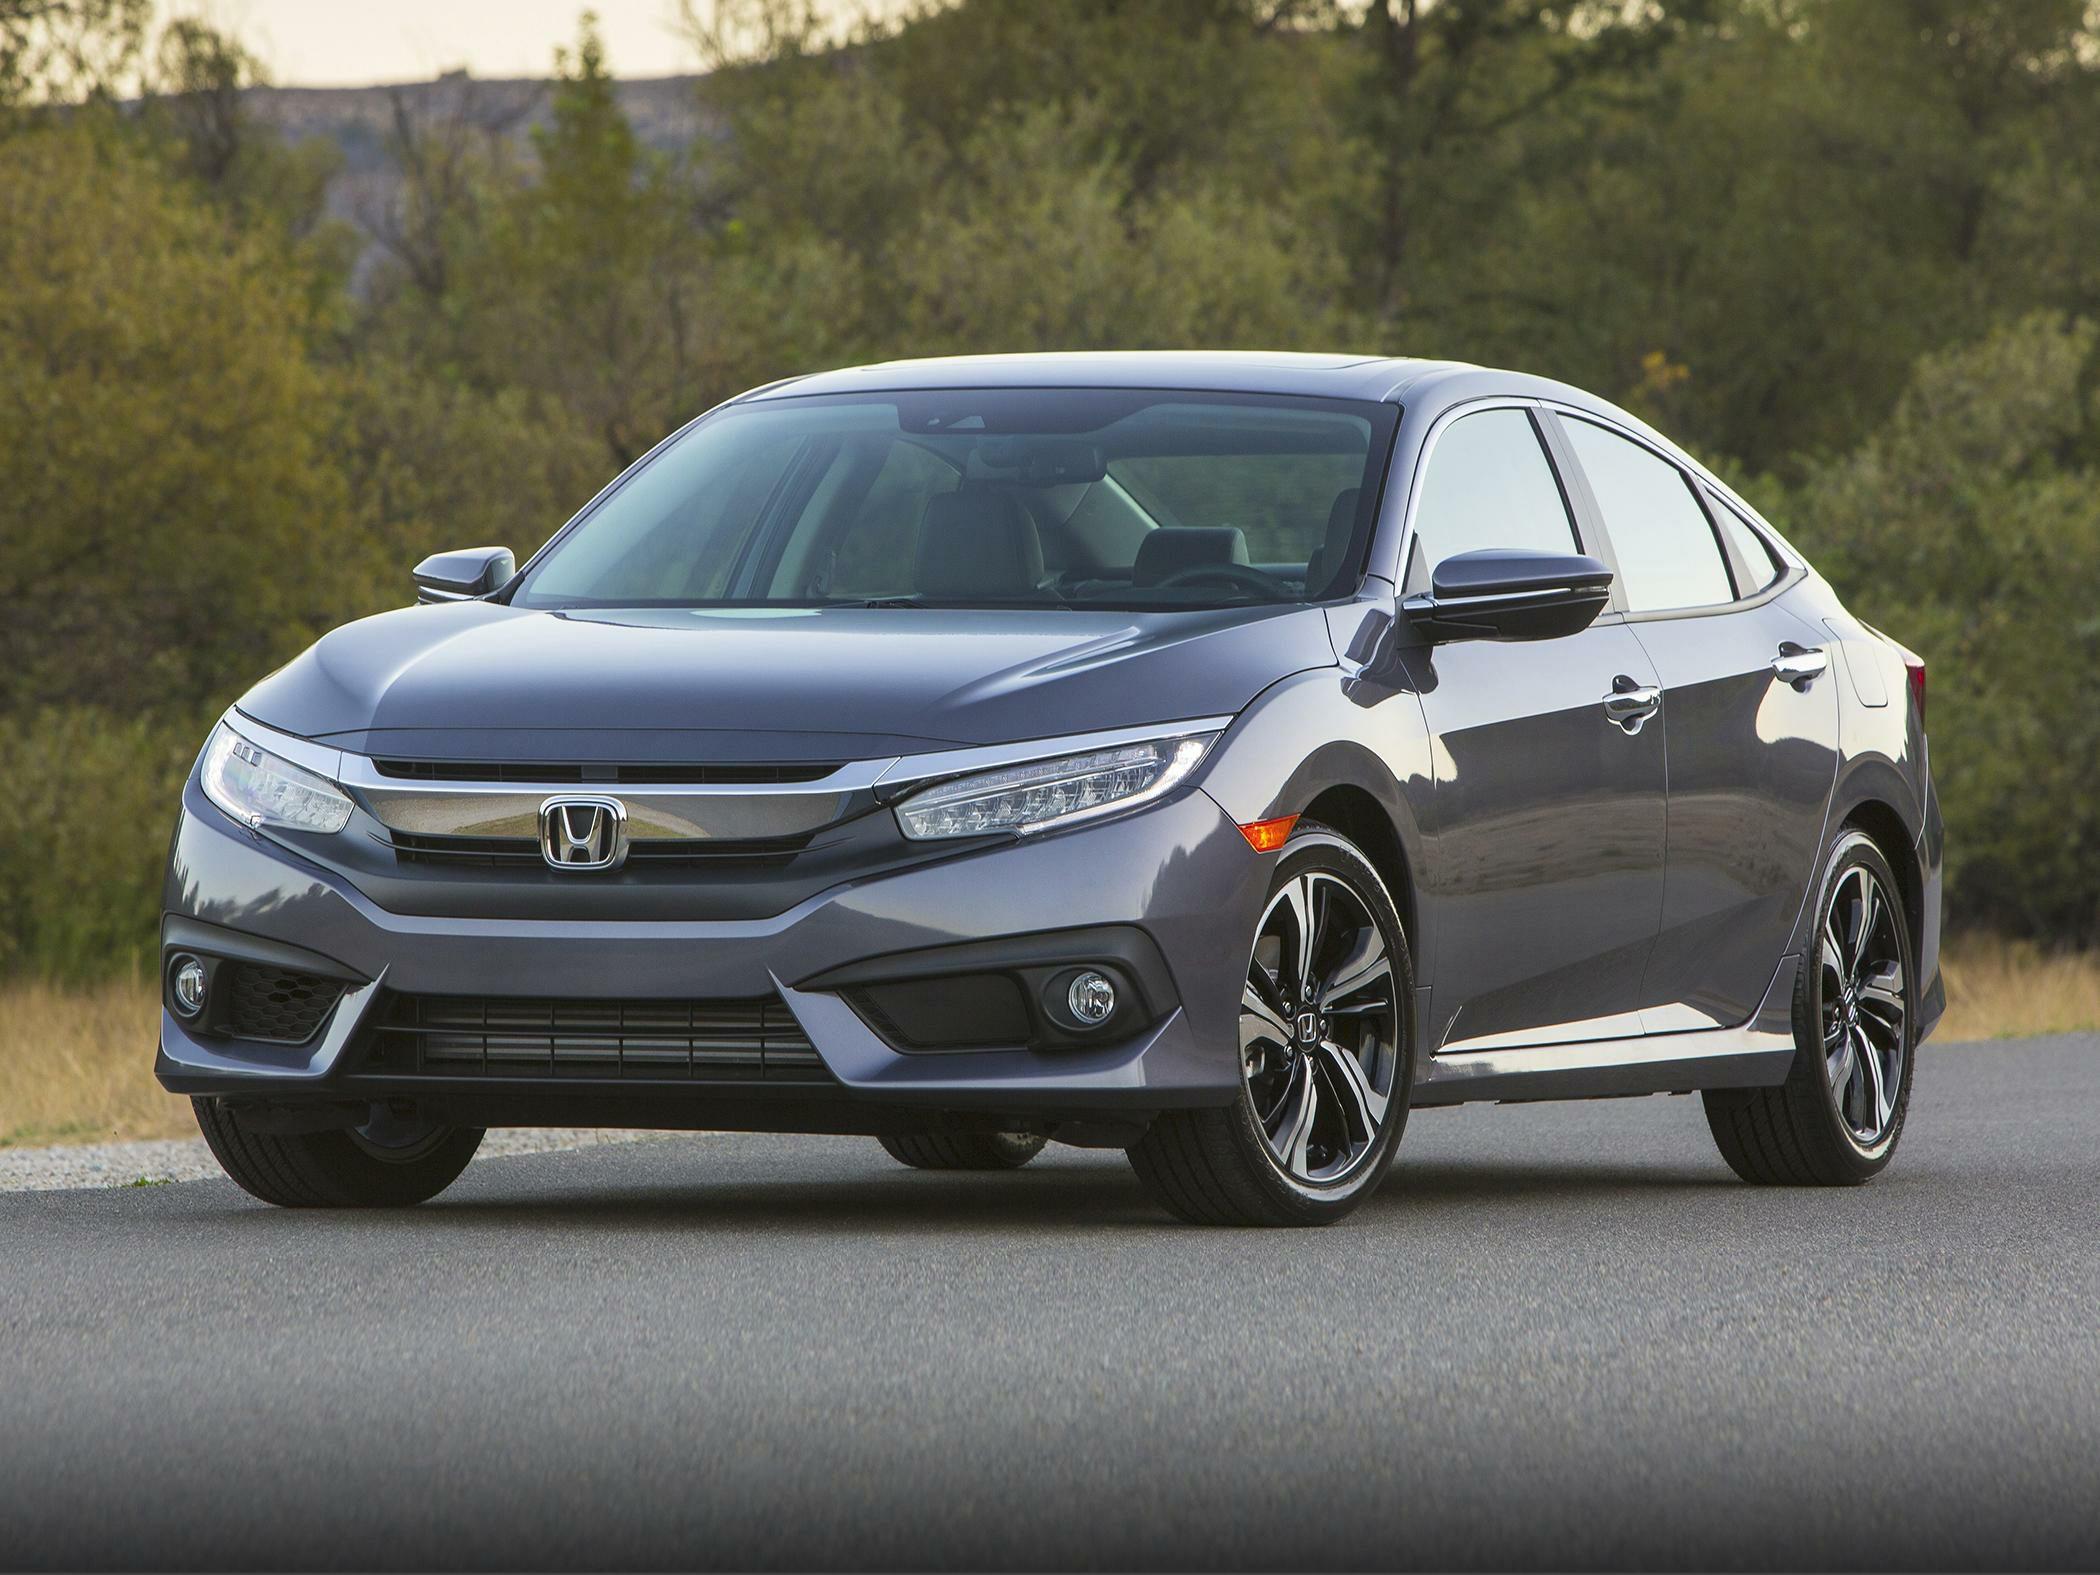 civic of details for used vehicles honda lx sedan image cvt vehicle sale in